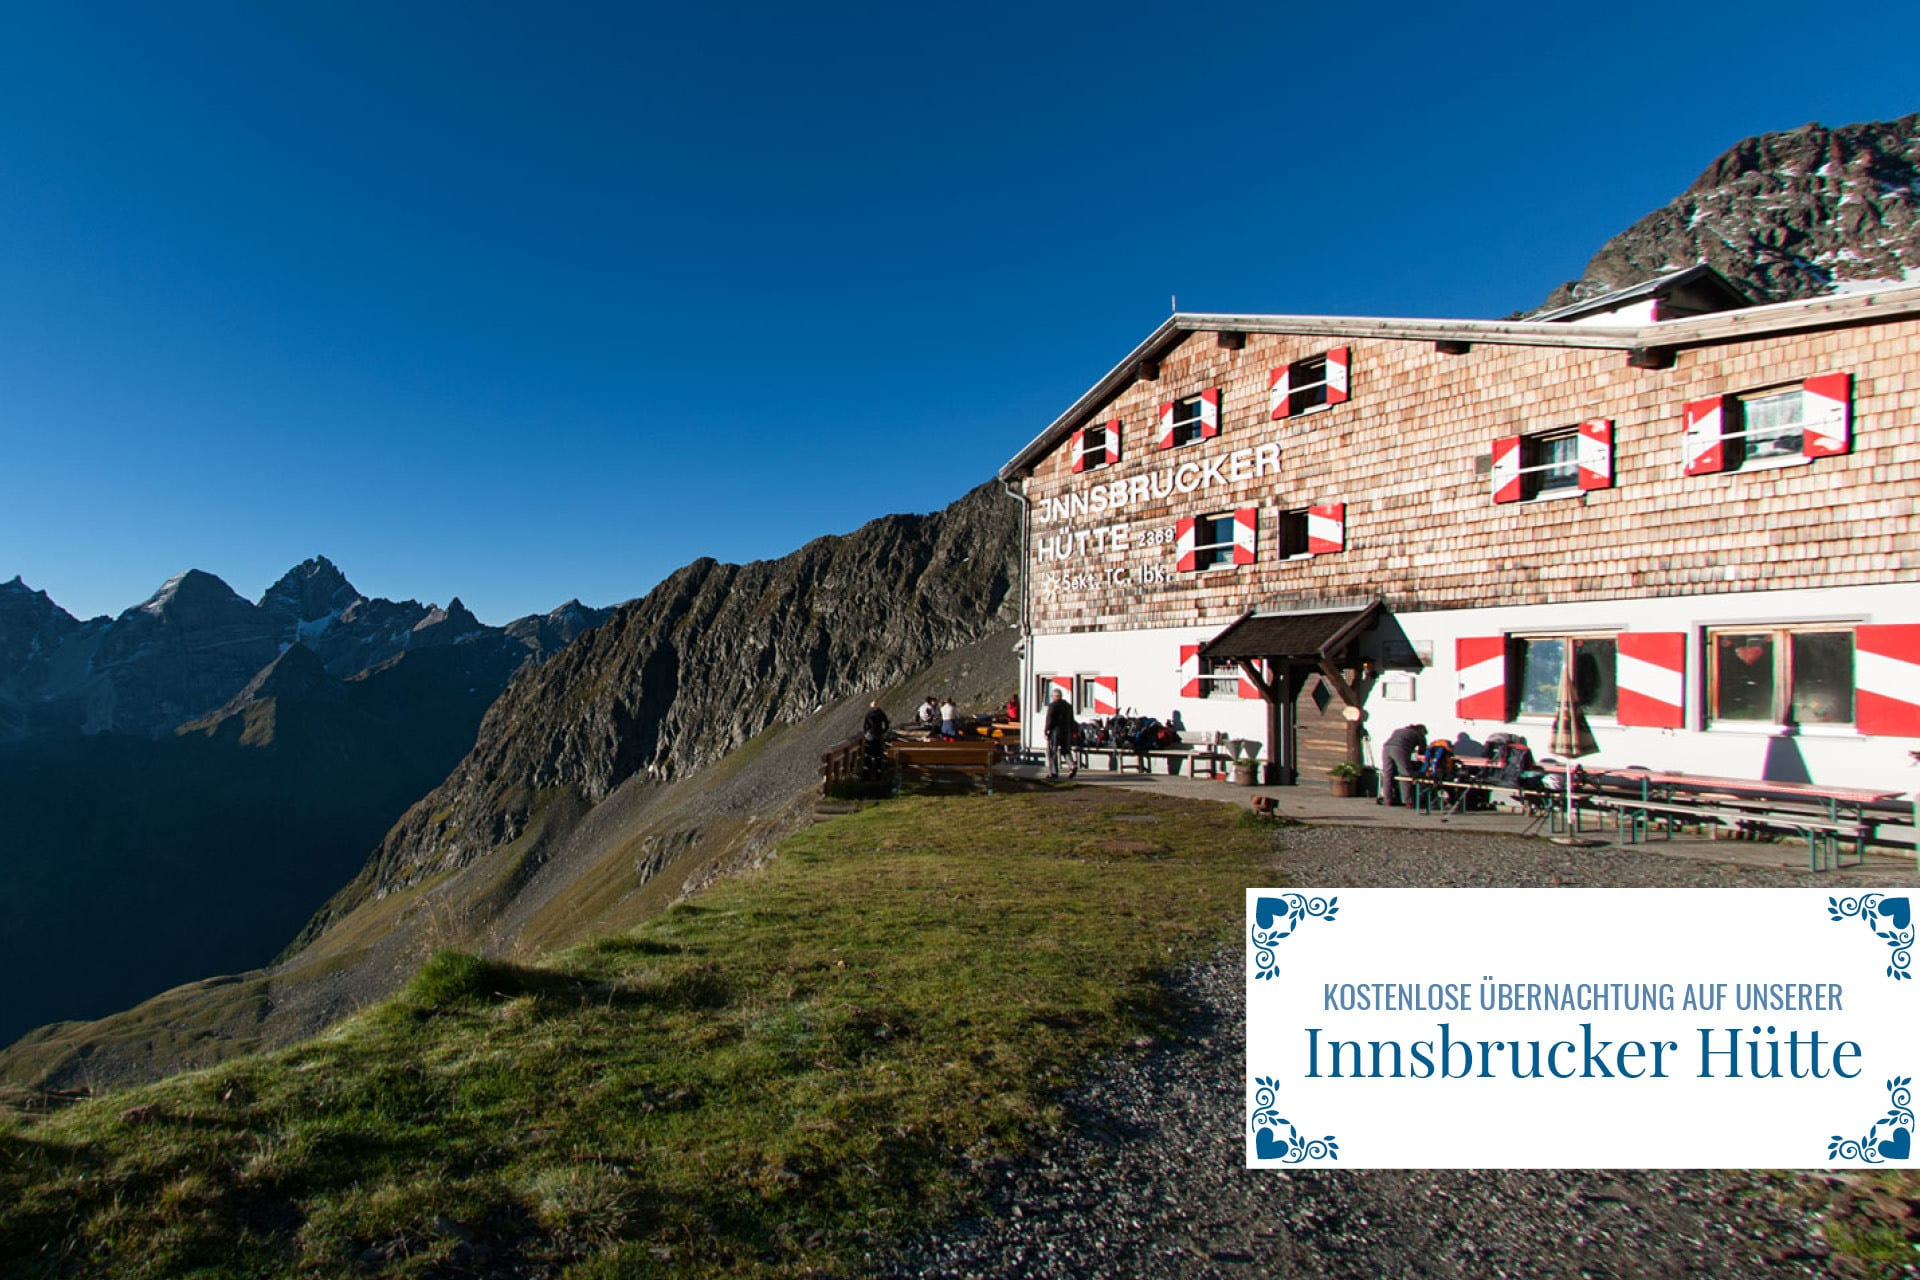 Sepp-und-Hannis-Stubaital-Sommerhighlight-Gratis-Huettenuebernachtung-Innsbrucker-Huette-Aktivurlaub-Tirol